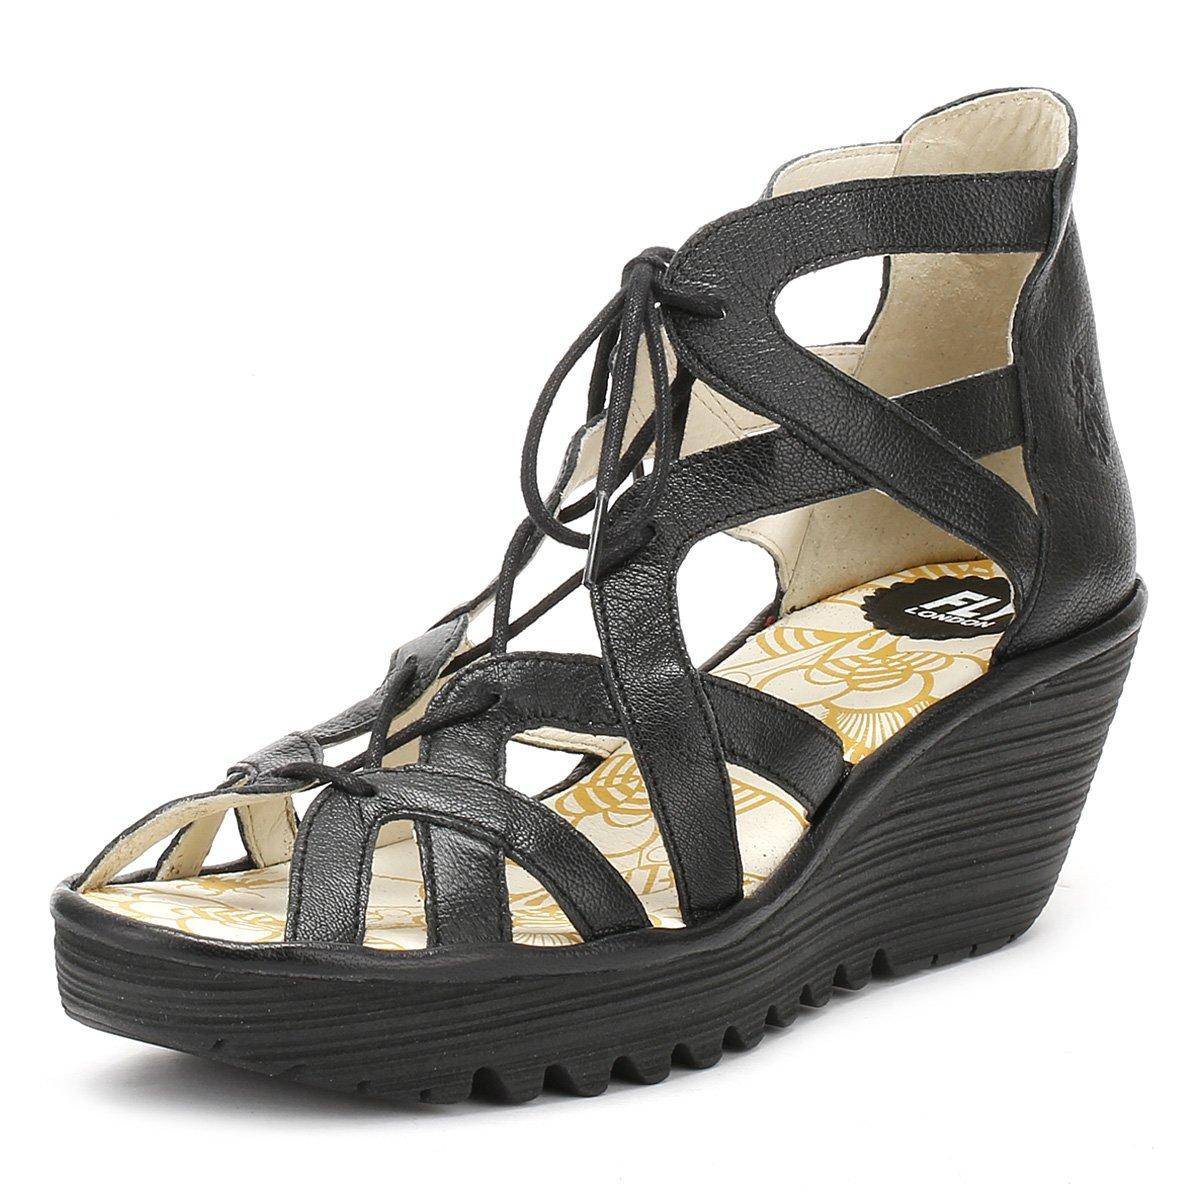 FLY London Womens YELI719FLY Wedge Leather Sandals B01NCP7KS2 37 M EU / 6.5-7 B(M) US|Black